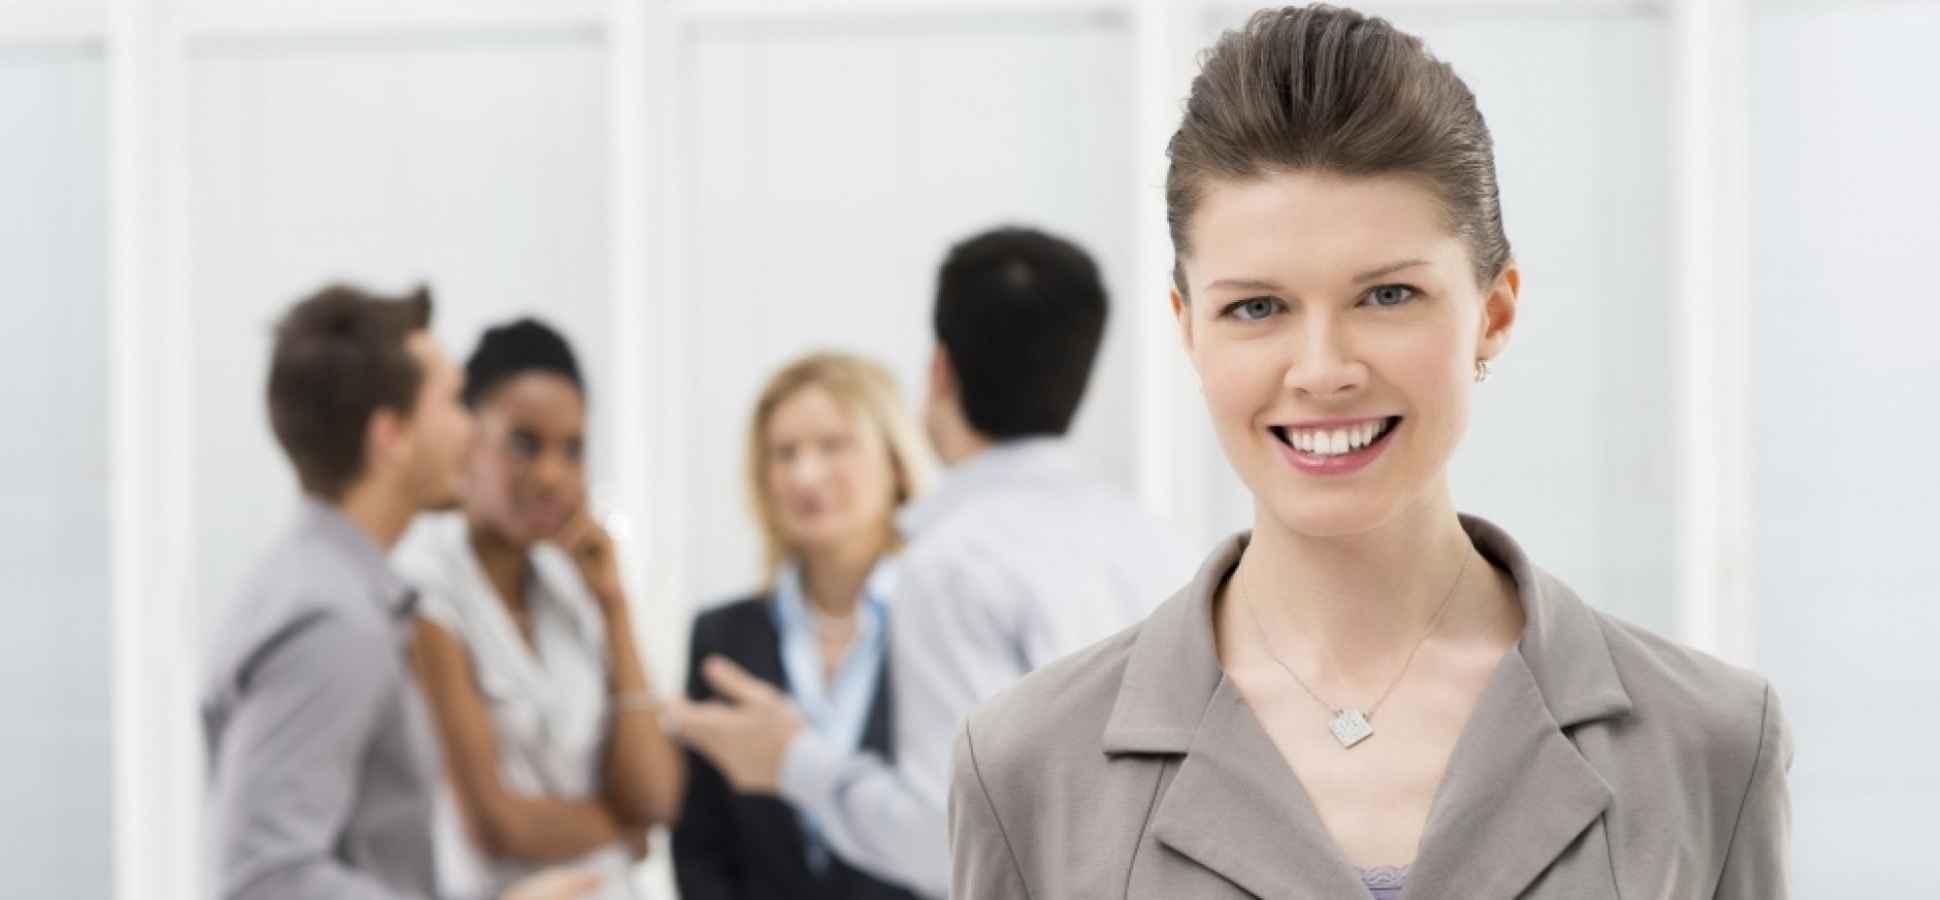 4 Ways Employees Lead With Emotional Intelligence